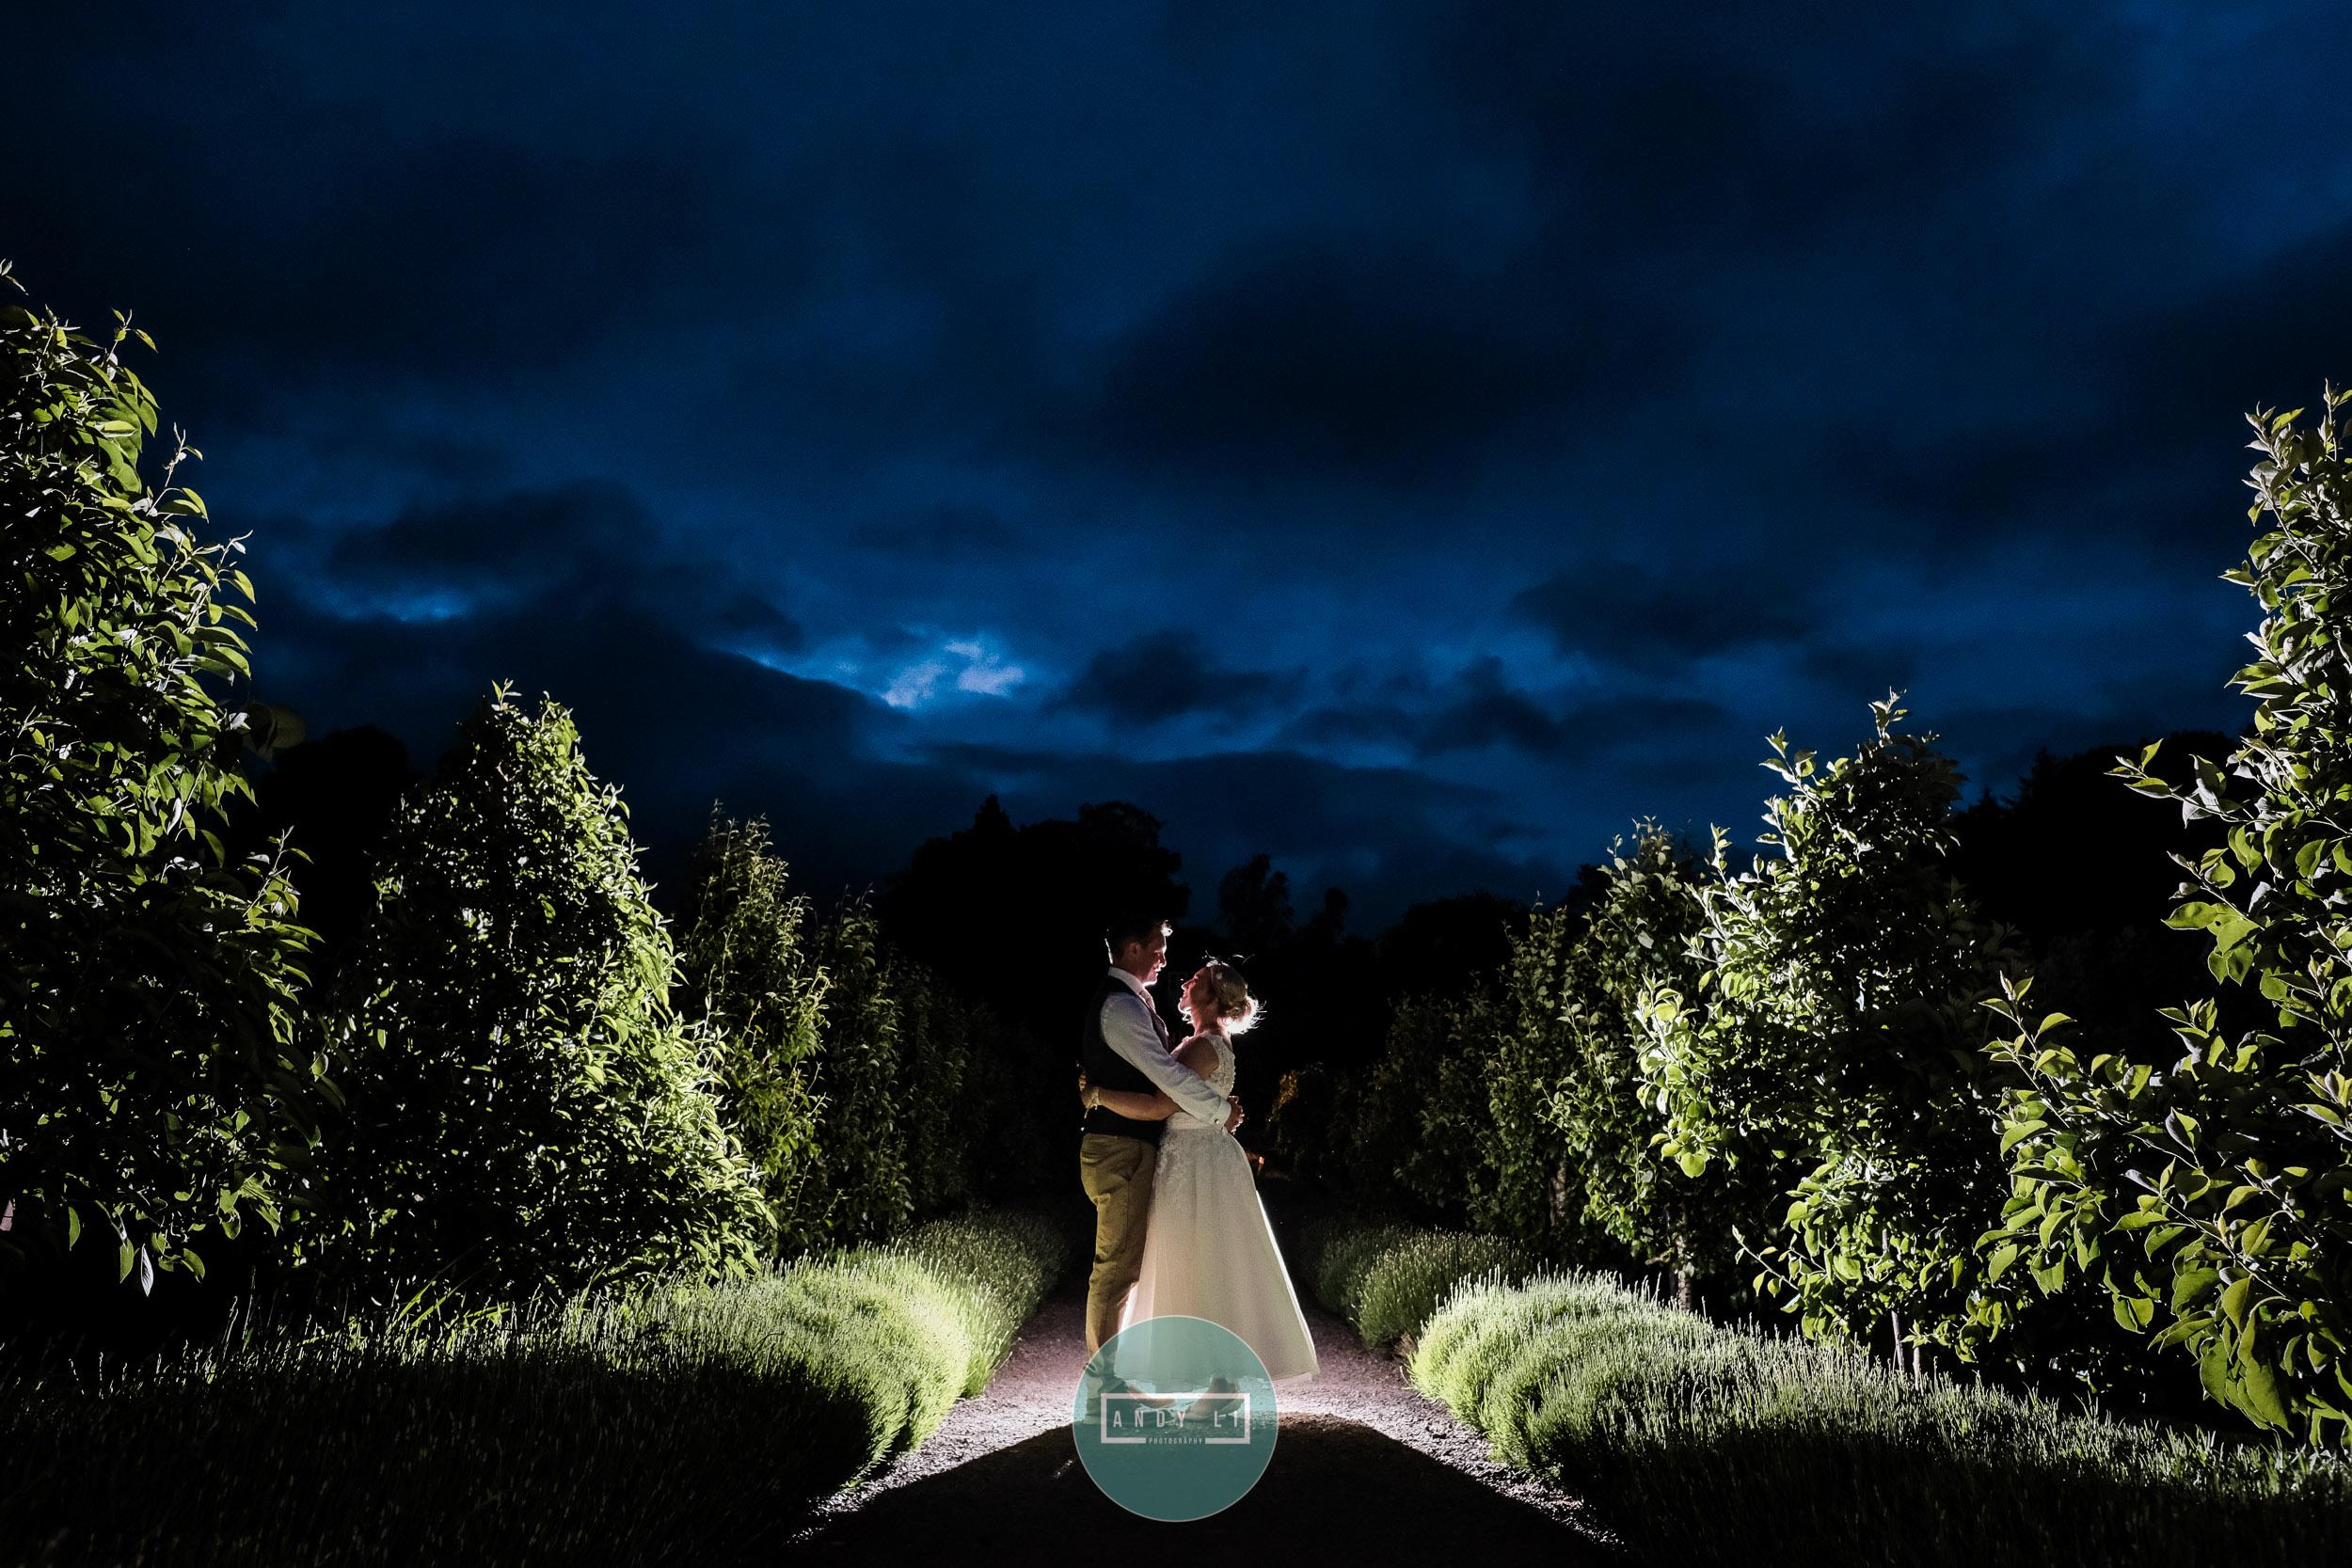 Sugnall Walled Garden Wedding Photographer-073-XPRO2119.jpg